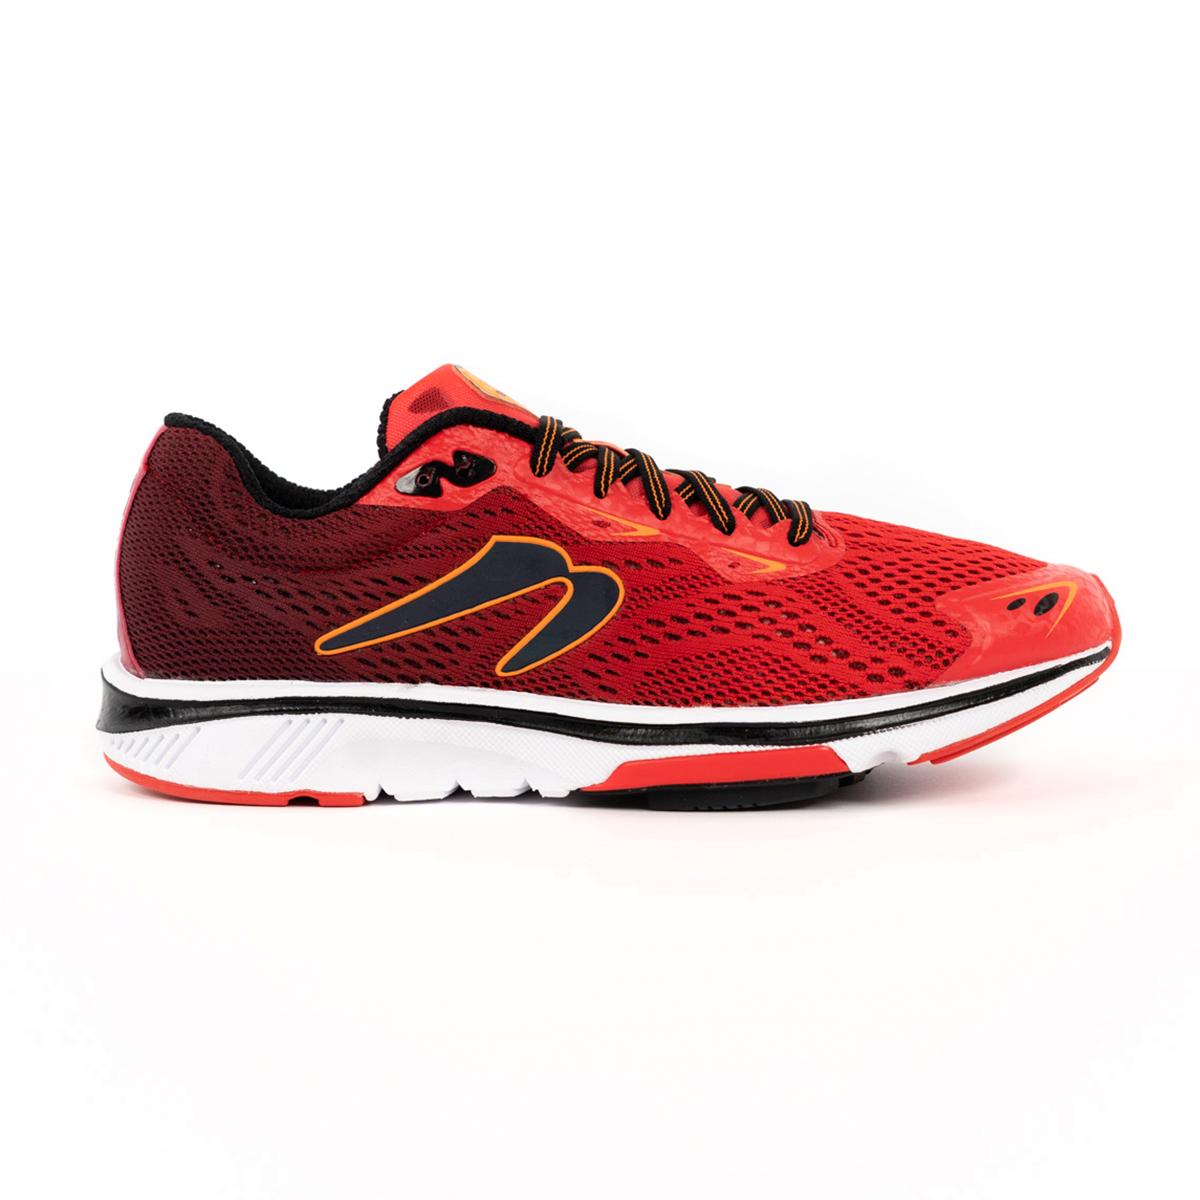 Men's Newton Motion 9 Running Shoe - Color: Brick/Orange (Regular Width) - Size: 6, Brick/Orange, large, image 1